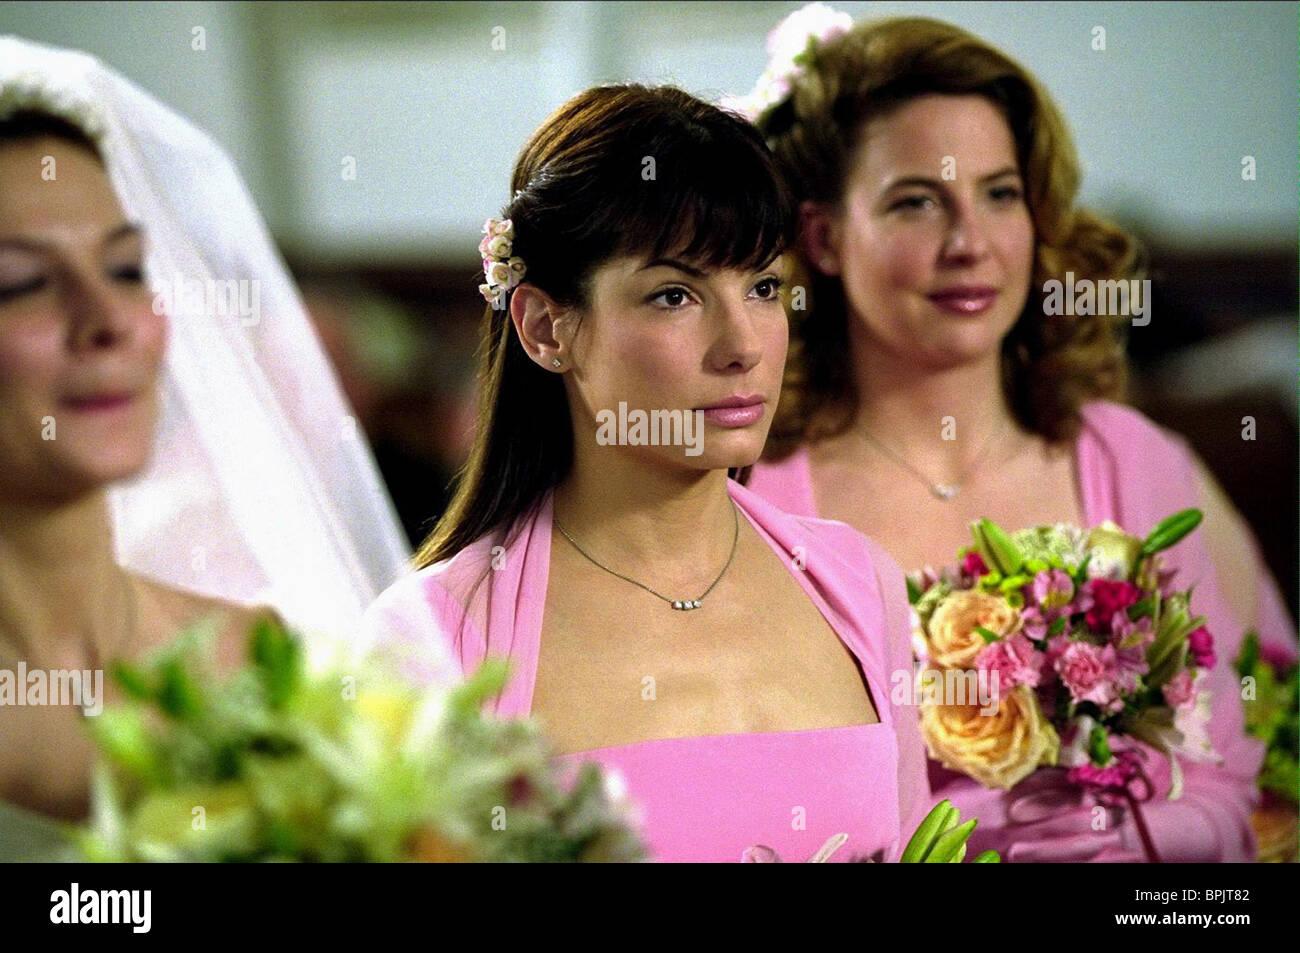 Sandra Bullock Two Weeks Notice 2002 Stock Photo Alamy